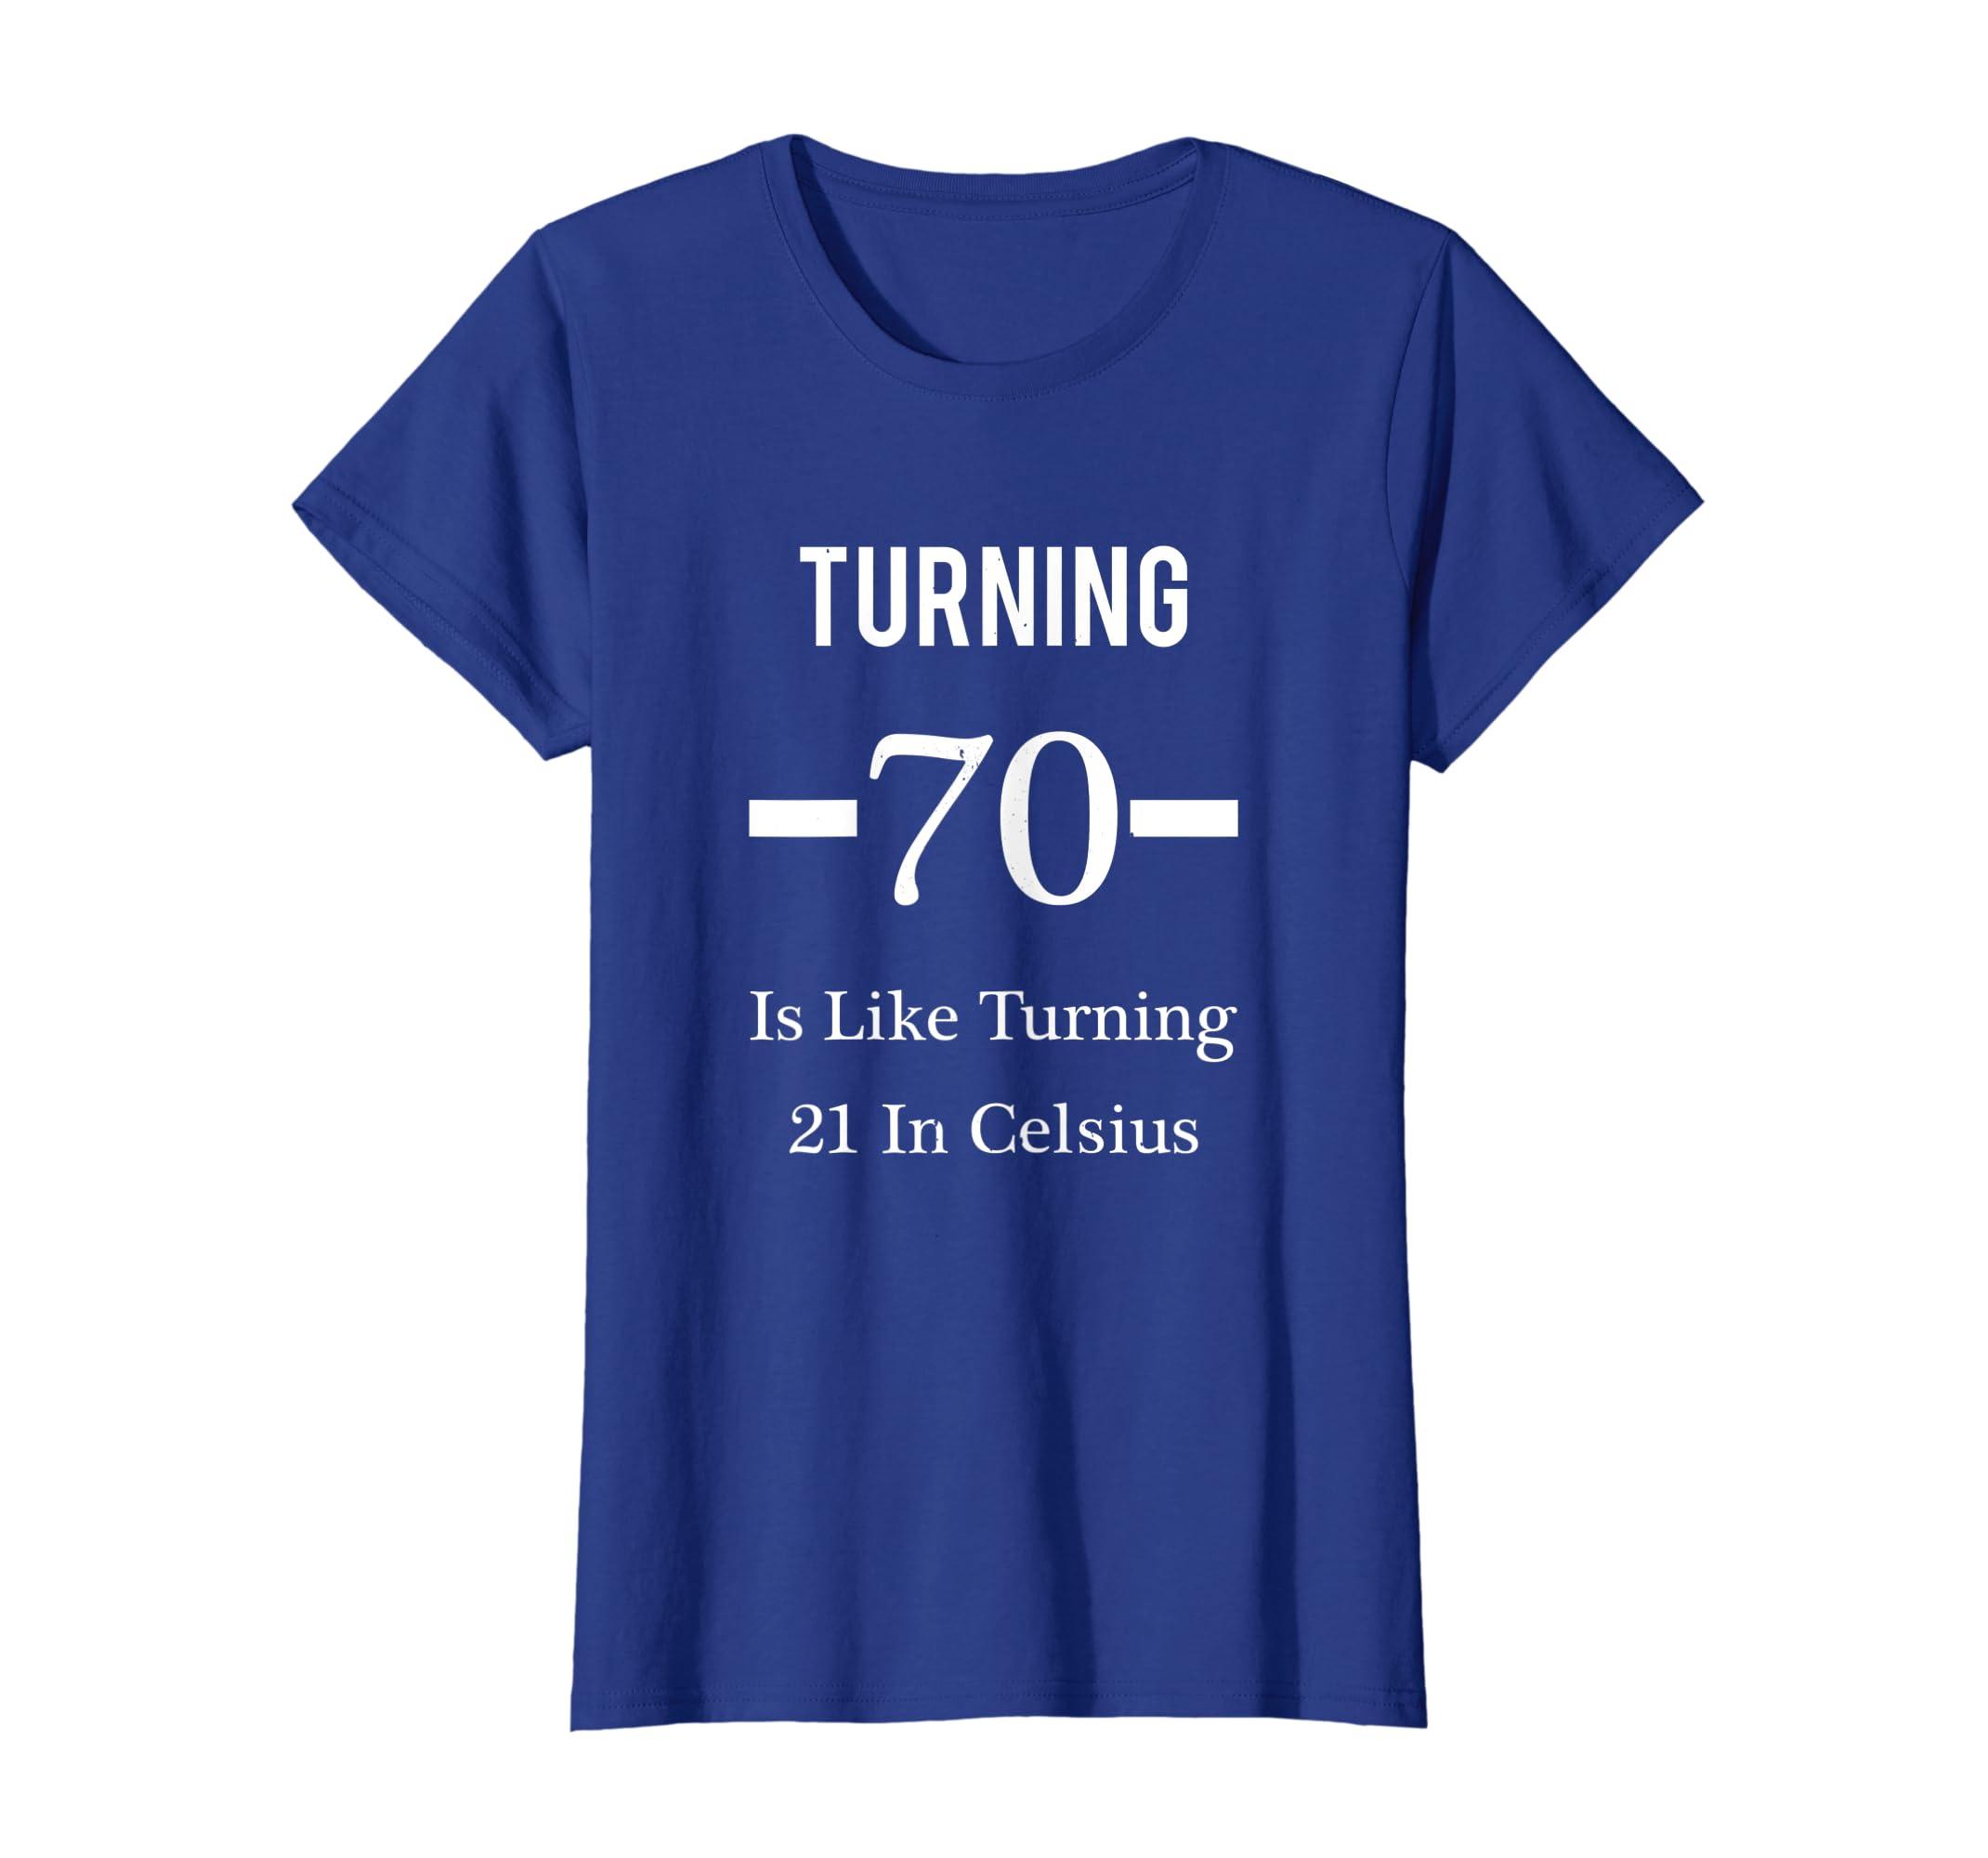 4534edf2 Amazon.com: Funny Happy 70th Birthday T-Shirt for Men or Women: Clothing